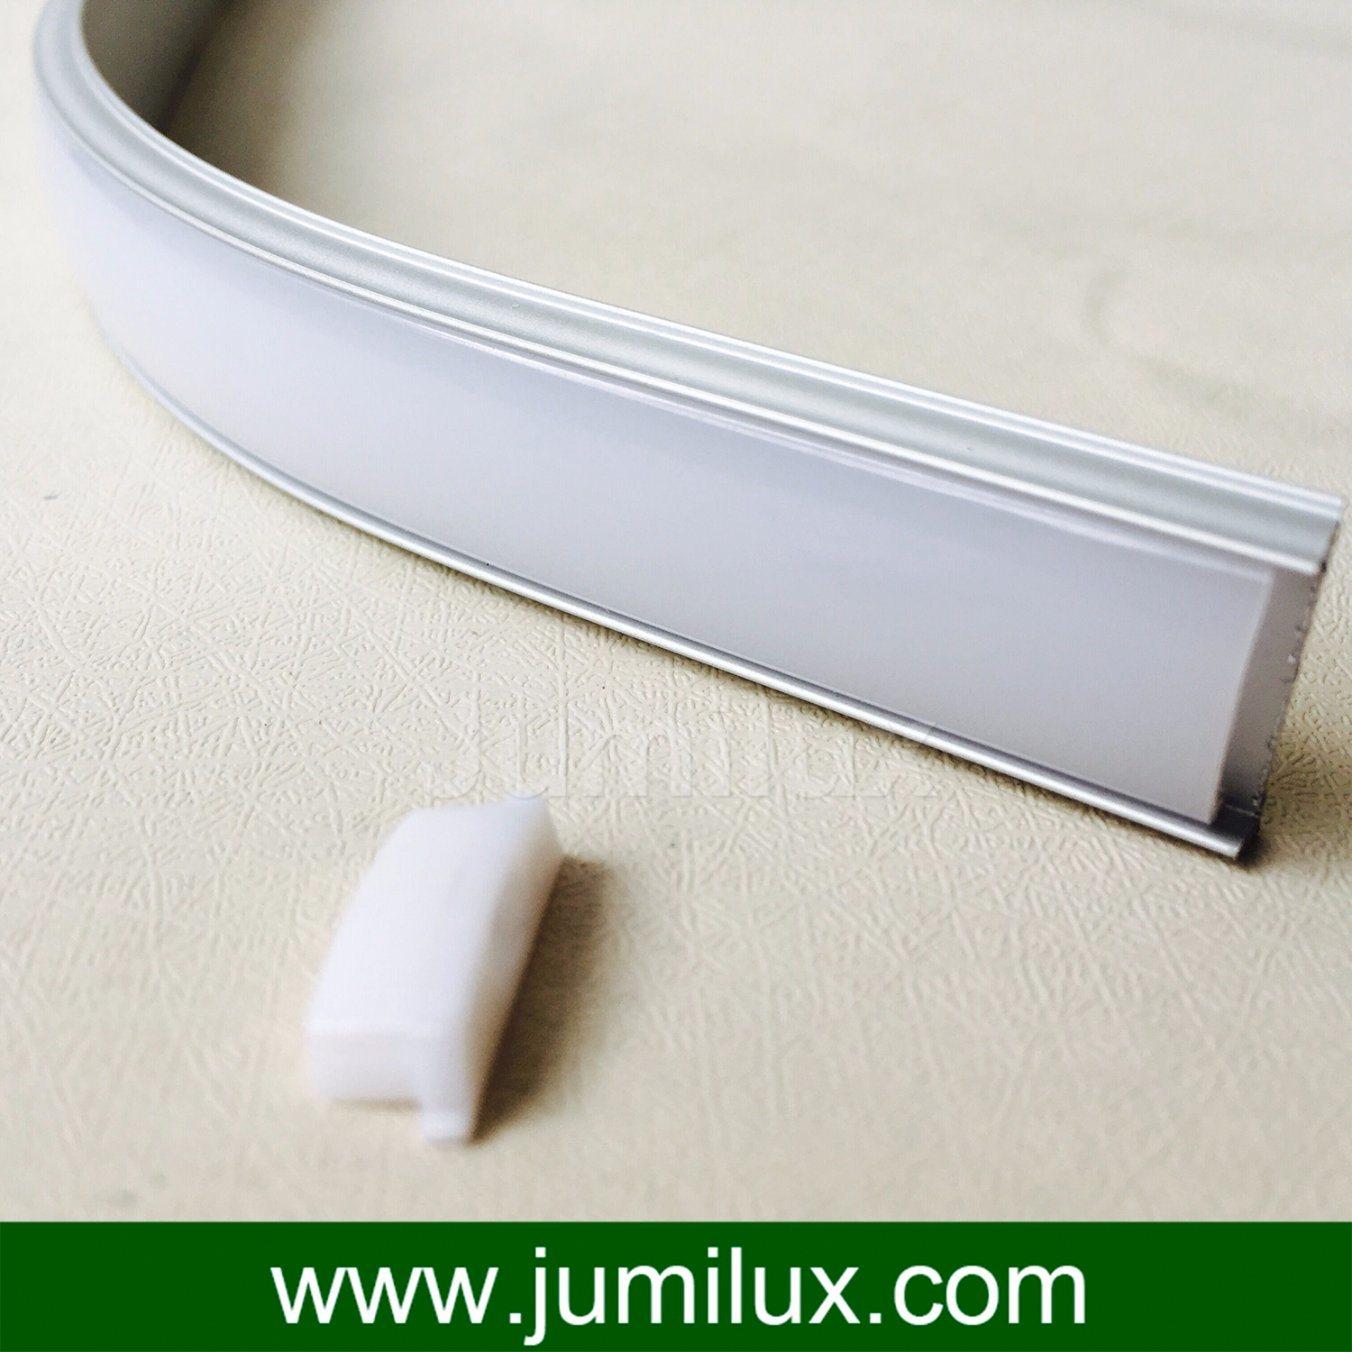 Bendable LED Channel Aluminum Extrusions Profile